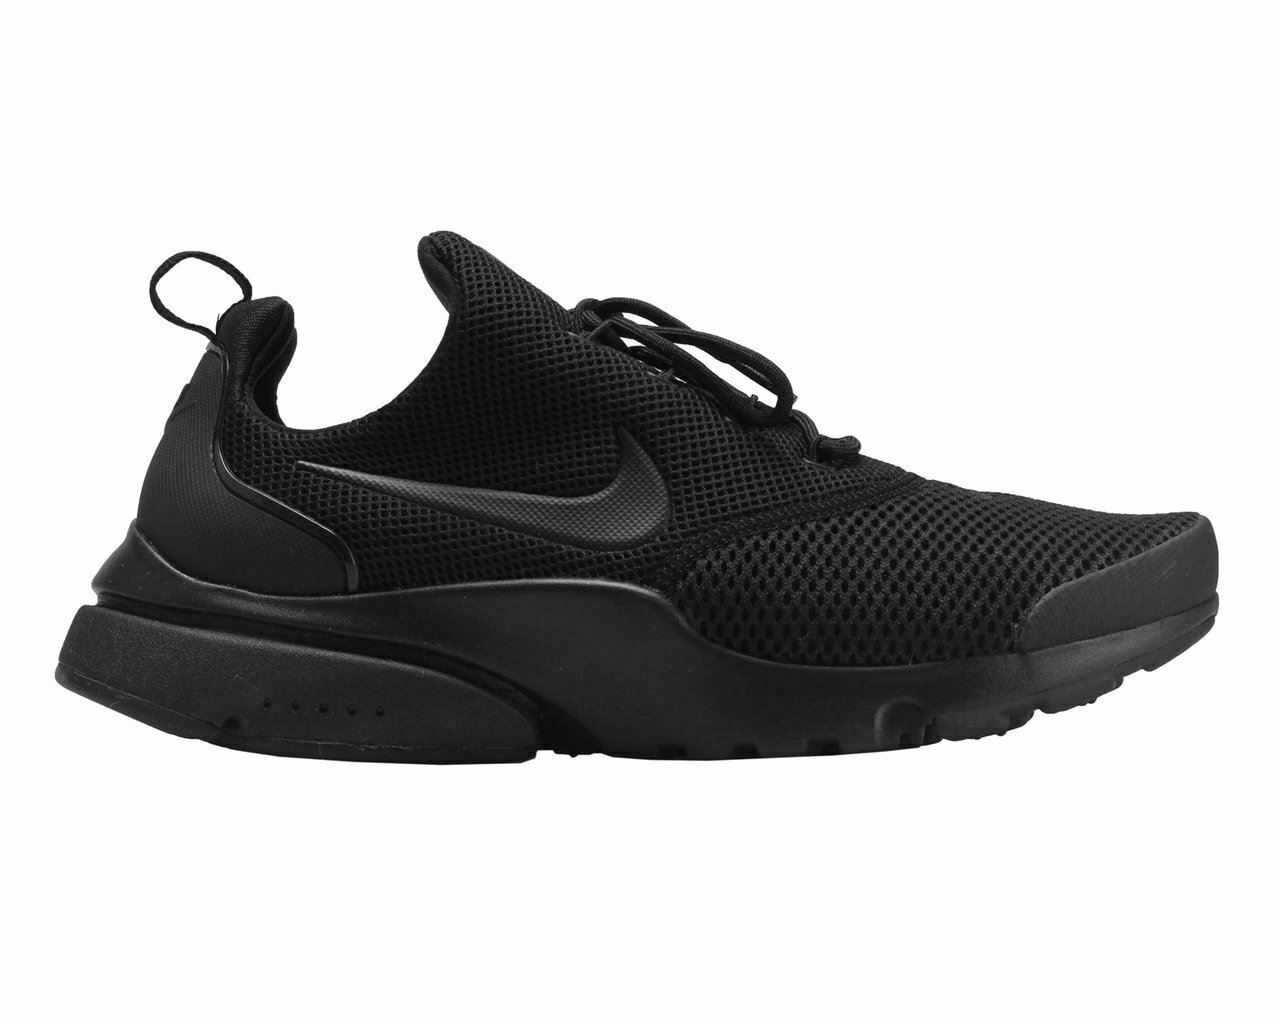 Mens Nike PRESTO FLY 908019 001 Gym shoes Black Trainers